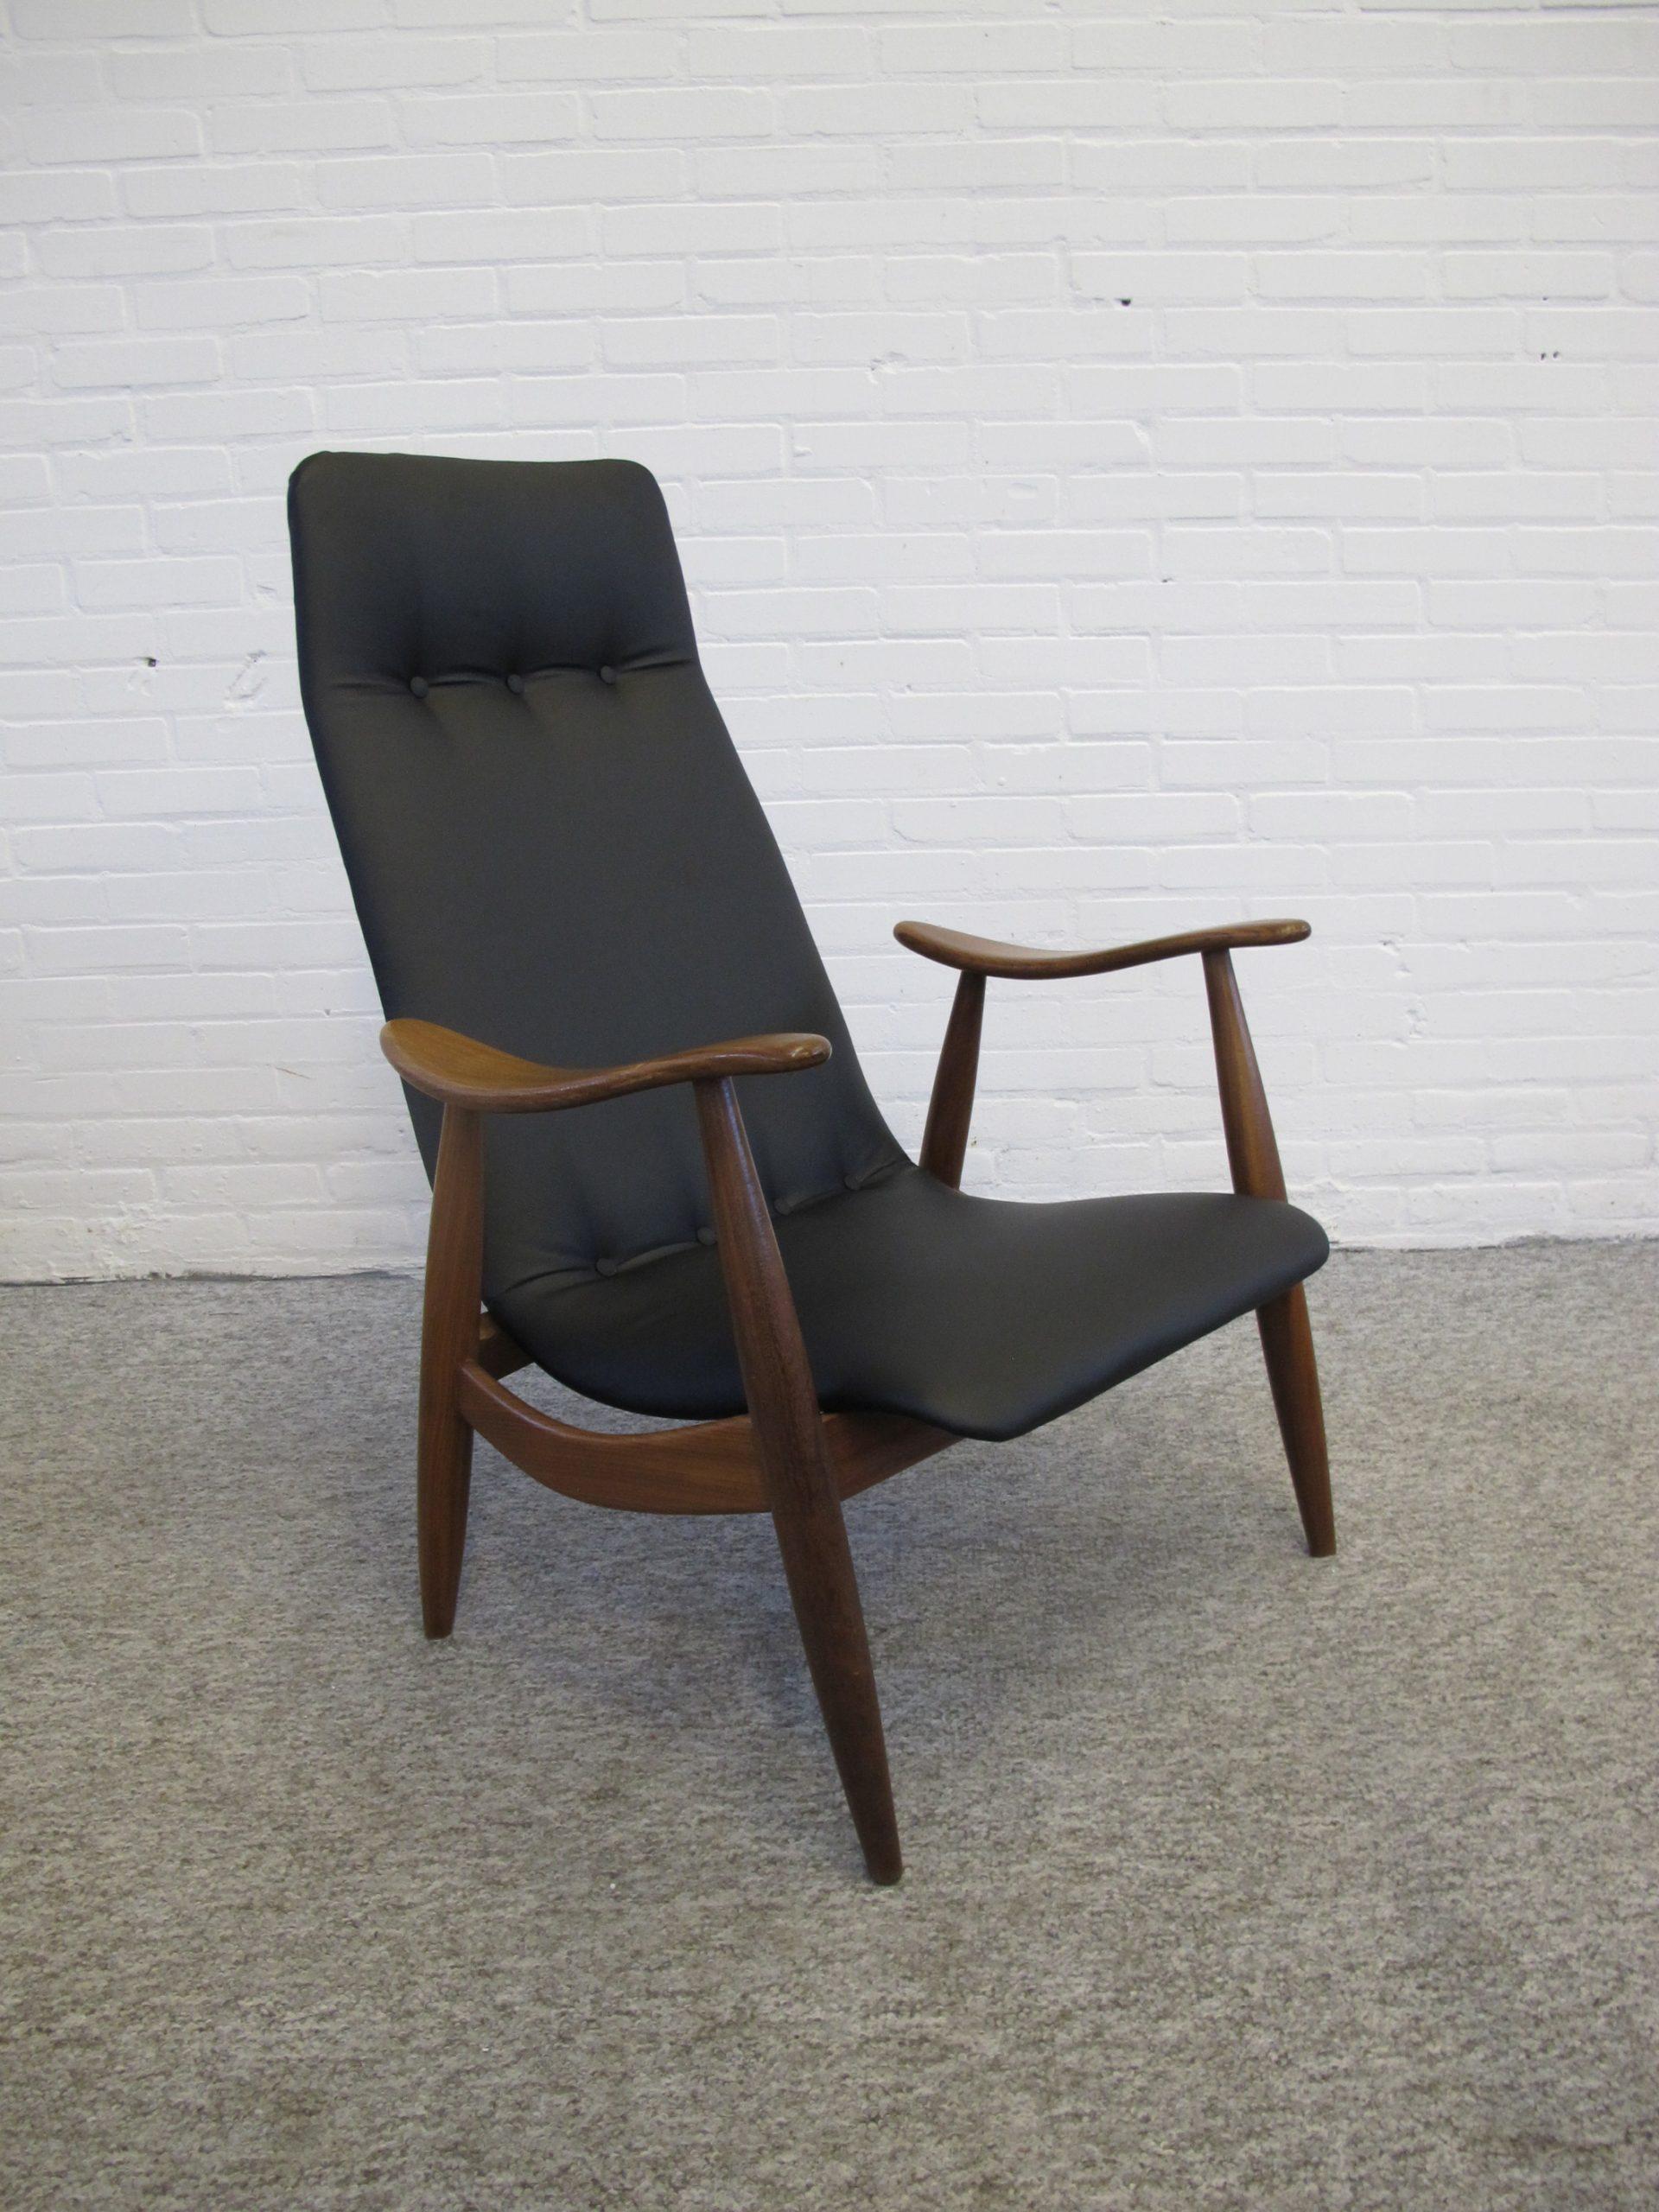 fauteuil lounge chair vintage louis van teeffelen midcentury webe